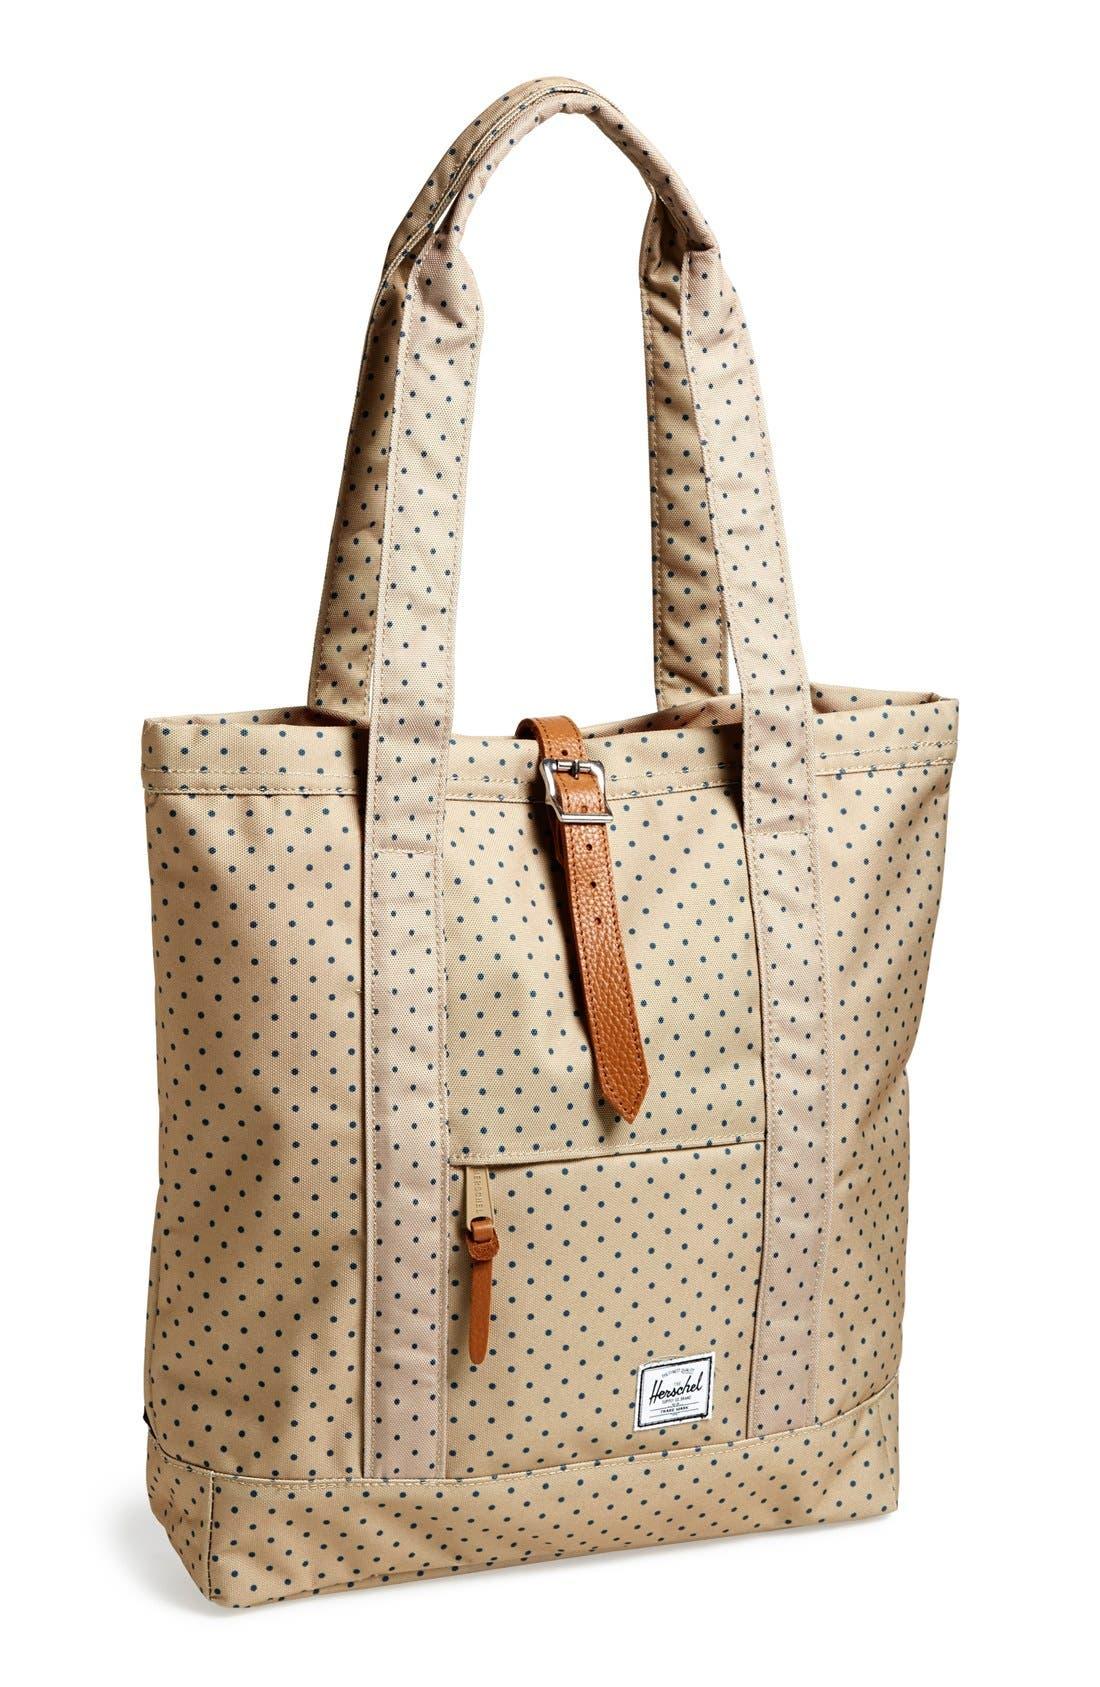 Main Image - Herschel Supply Co. 'Market' Tote Bag